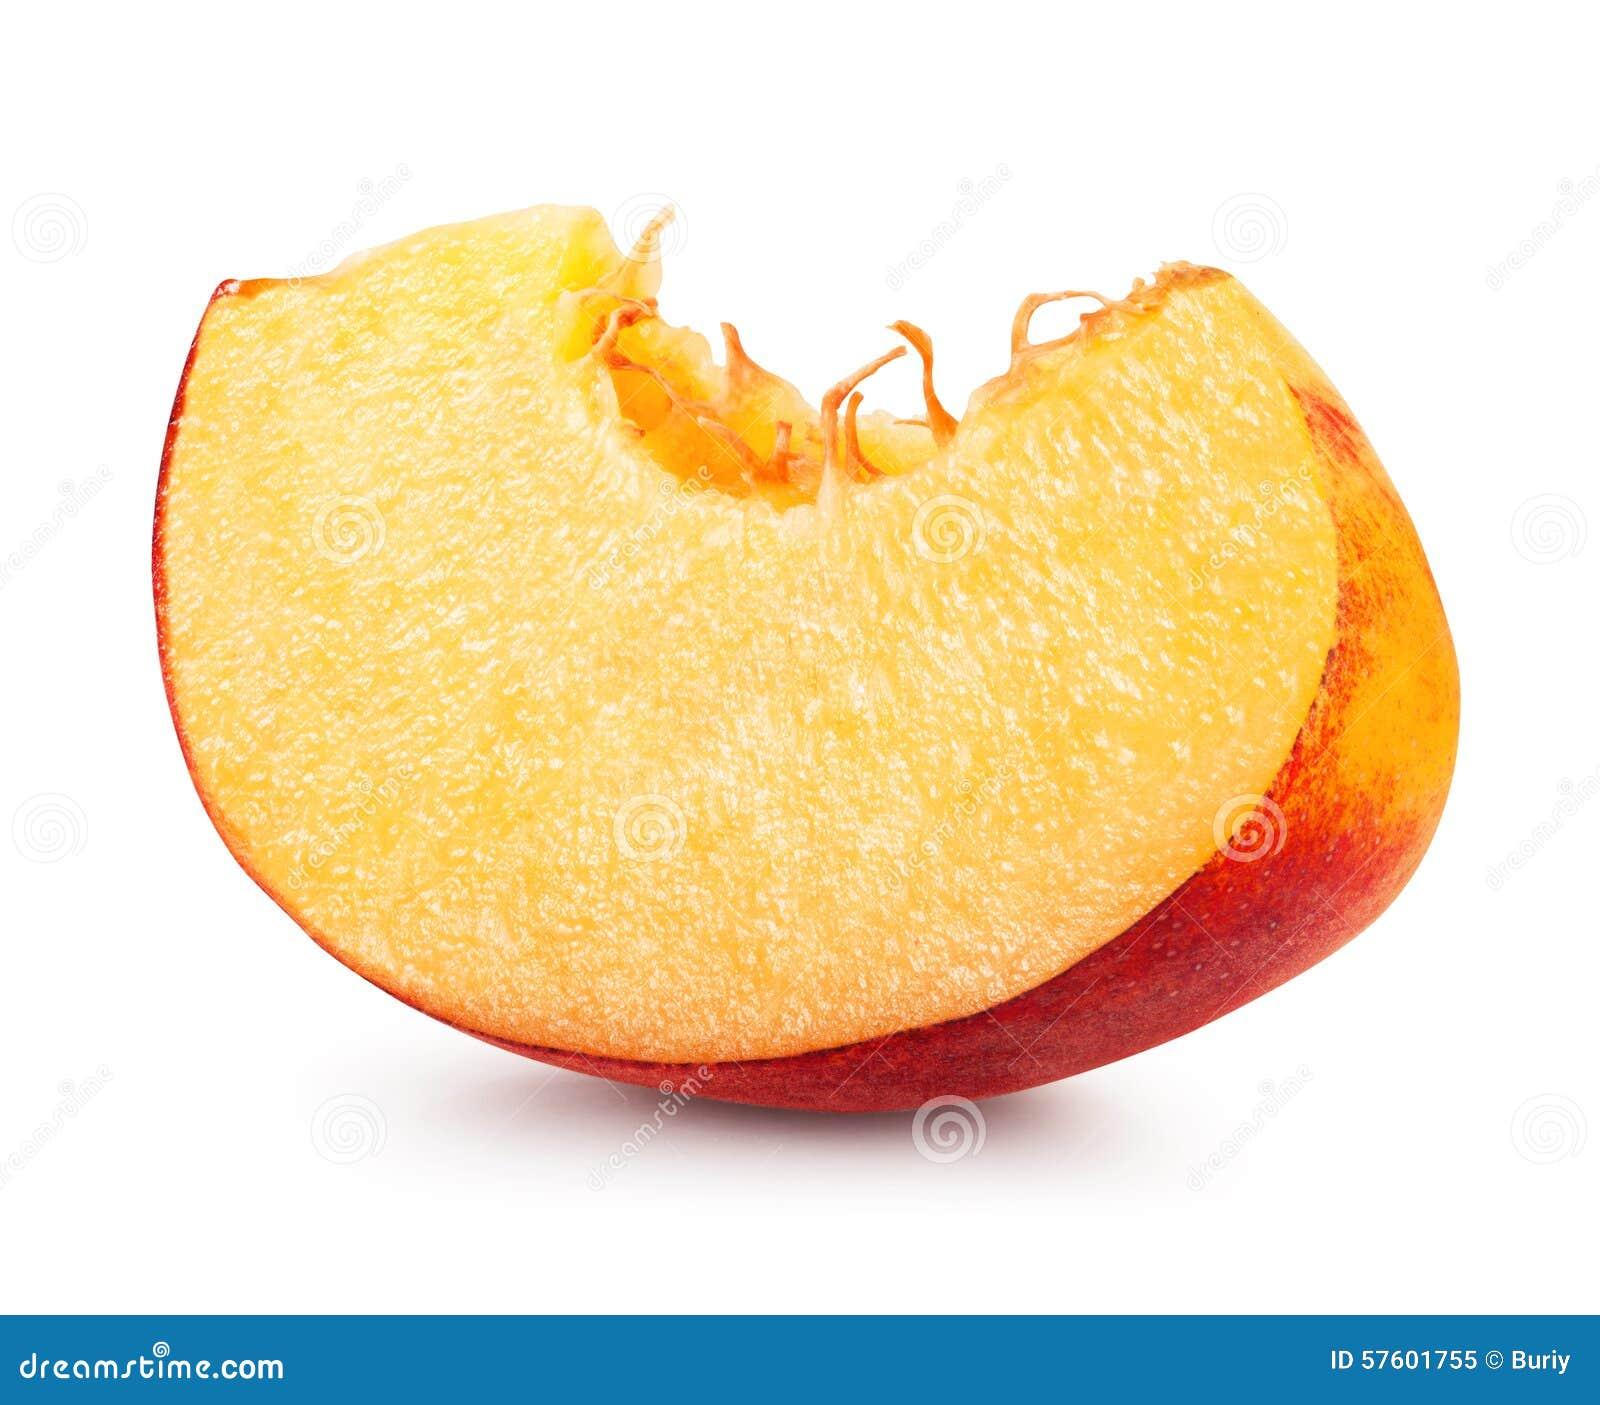 Peach slice stock image. Image of slice, juicy, part ...